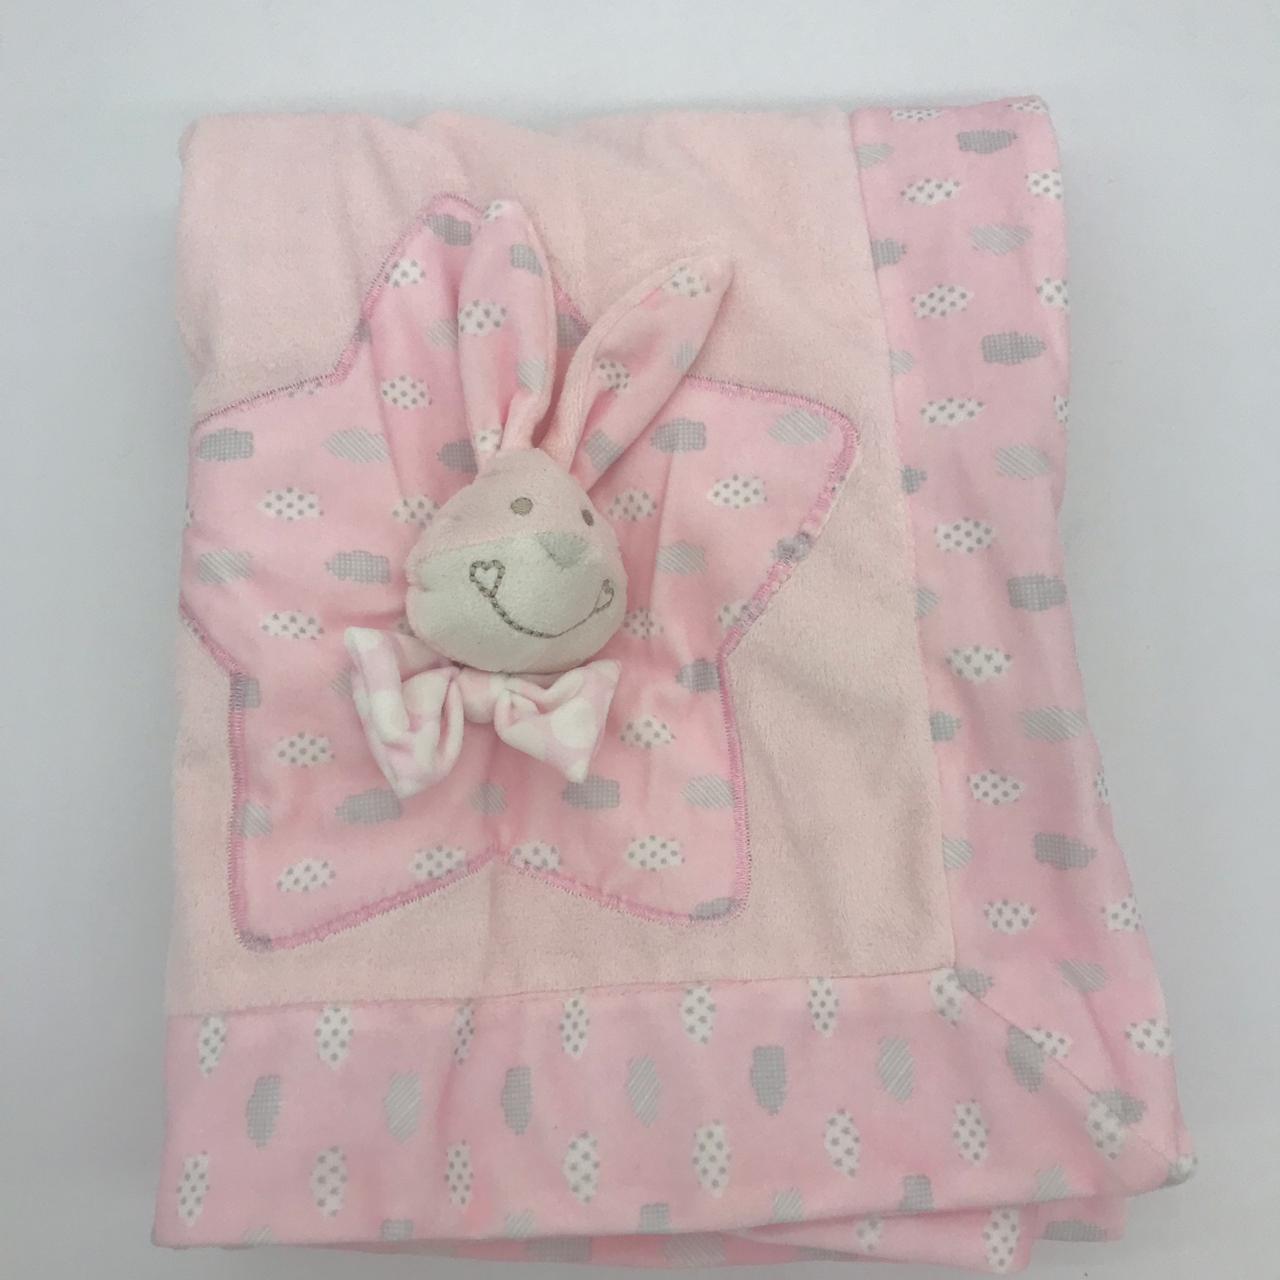 Manta Dobrada Coelhinha Rosa - Baby Joy Ref 20002